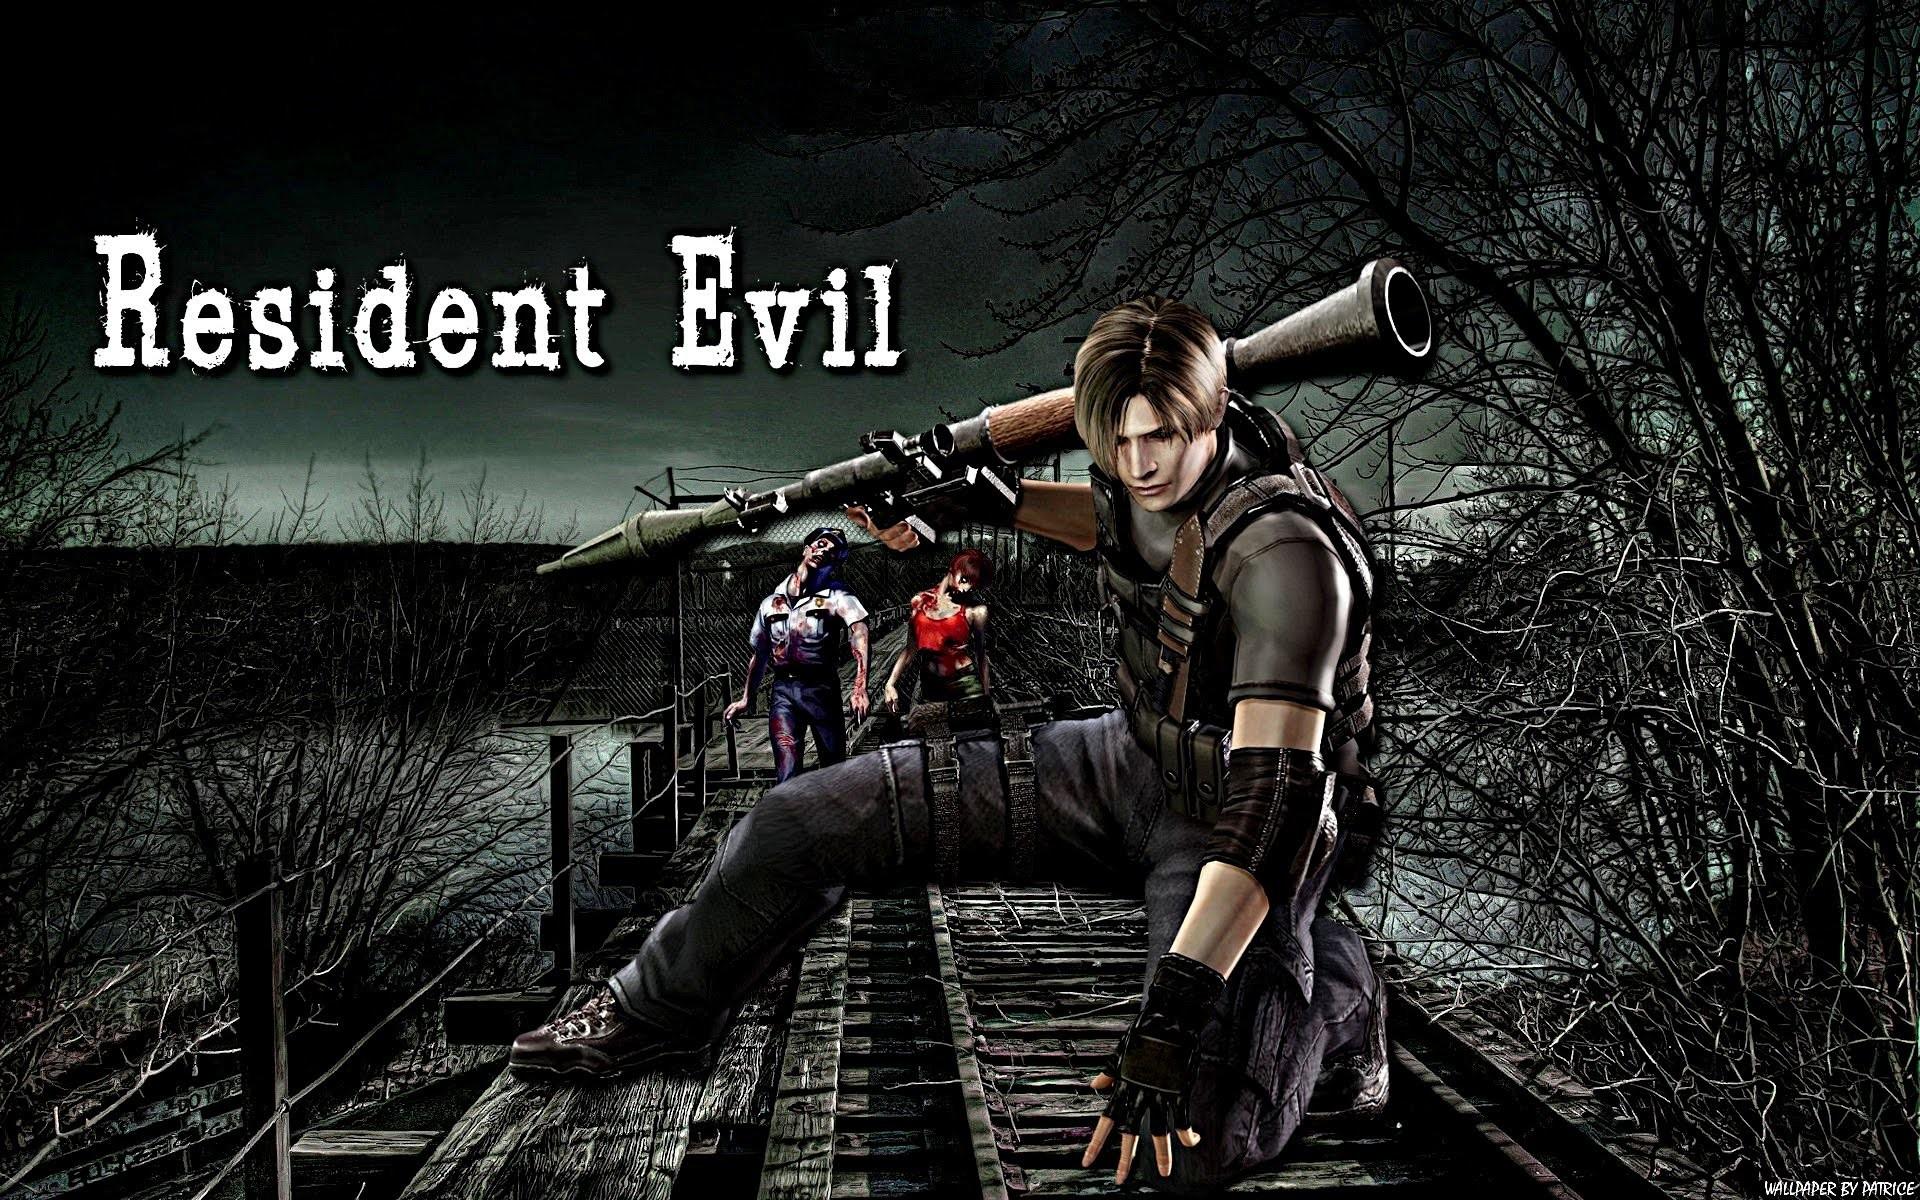 Pacote de Wallpapers (1080p) = Resident Evil #1